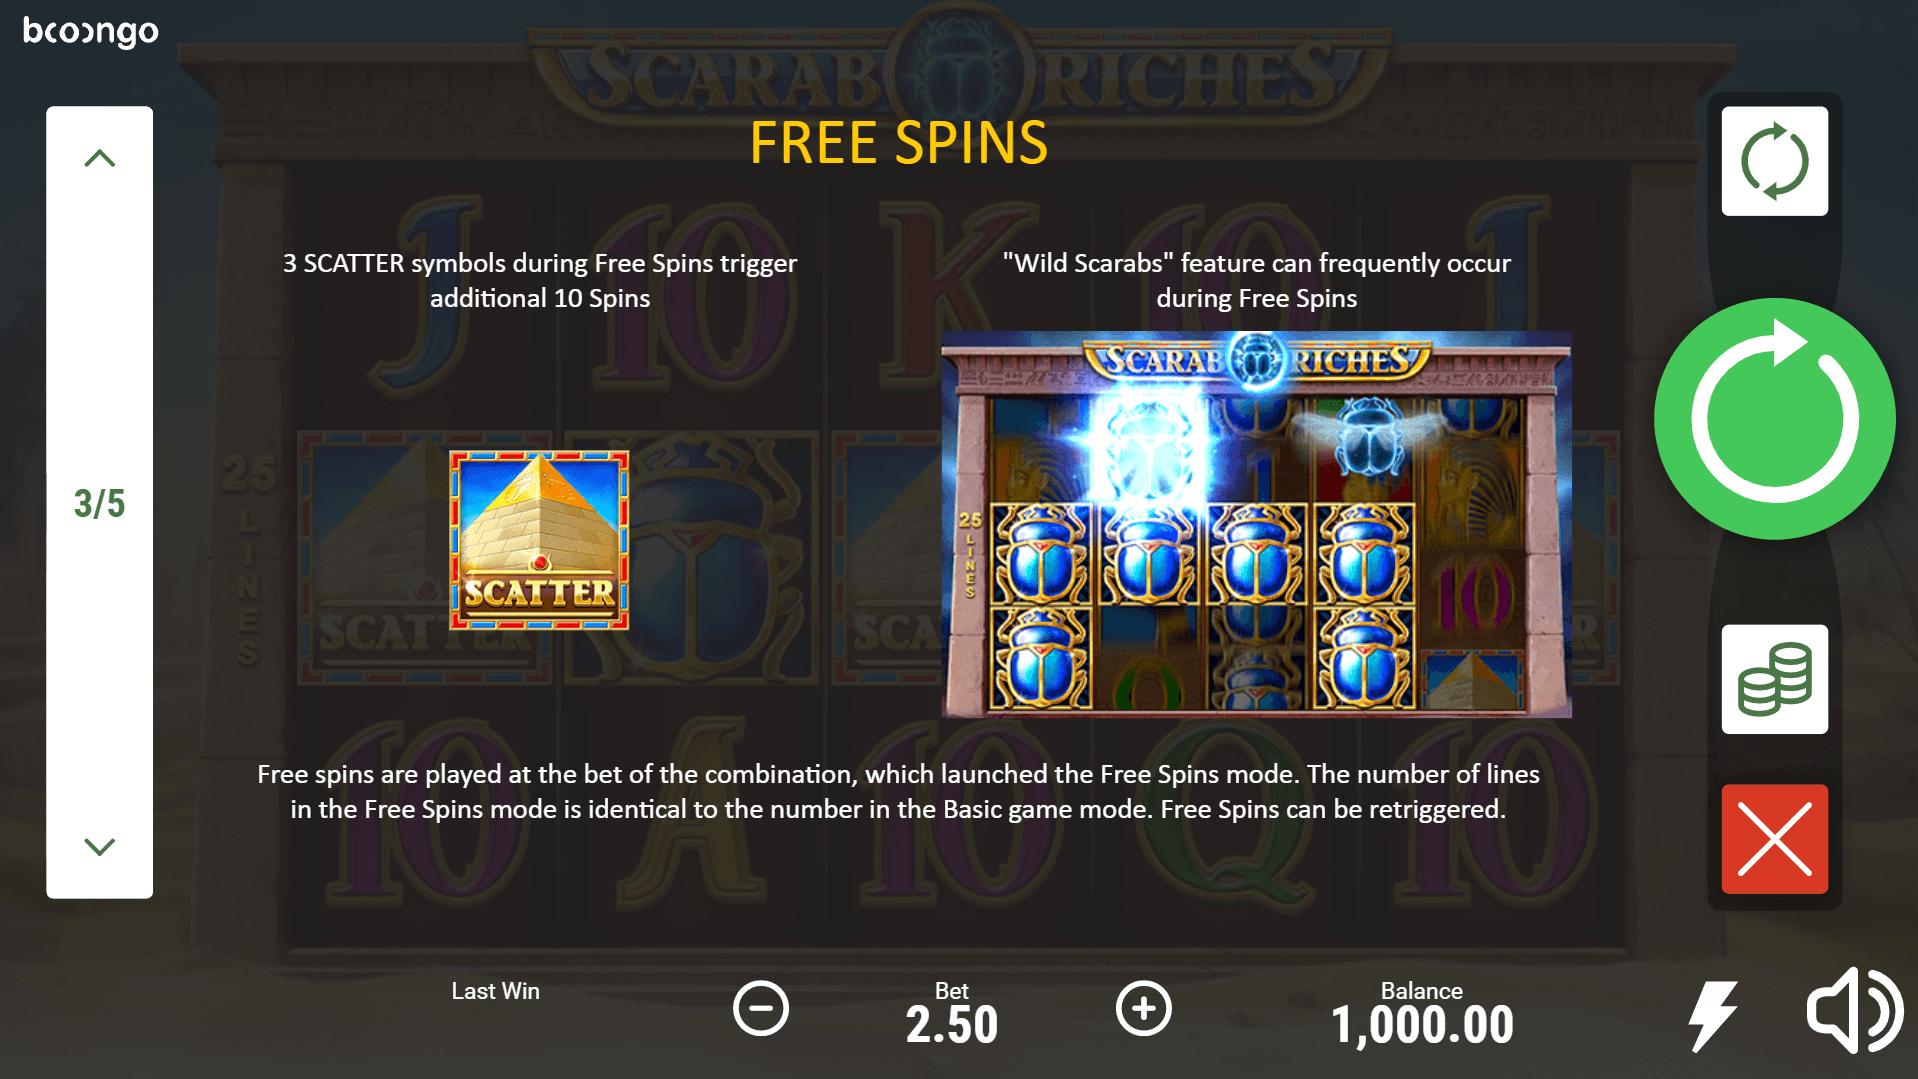 Scarab Riches Slot Machine